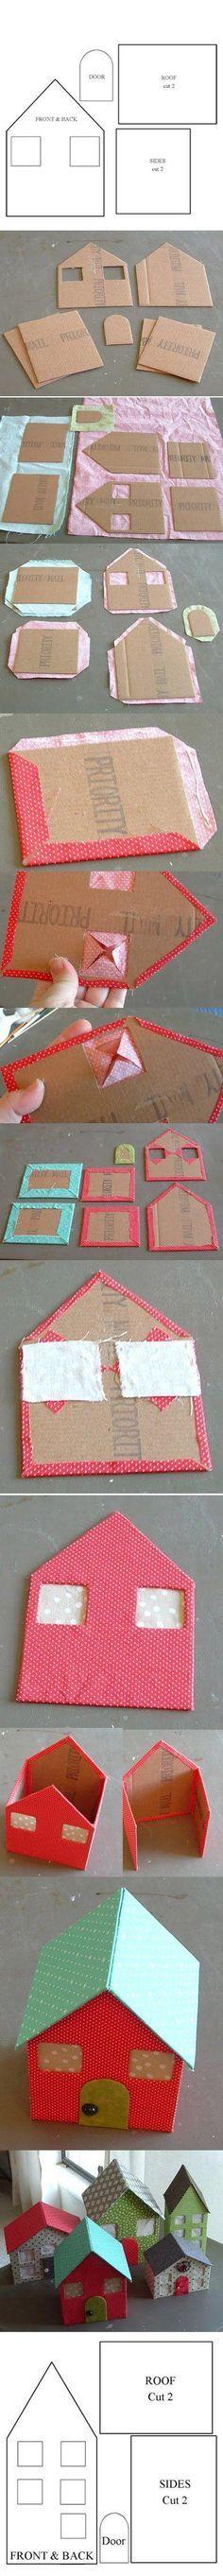 Domek z kartonu